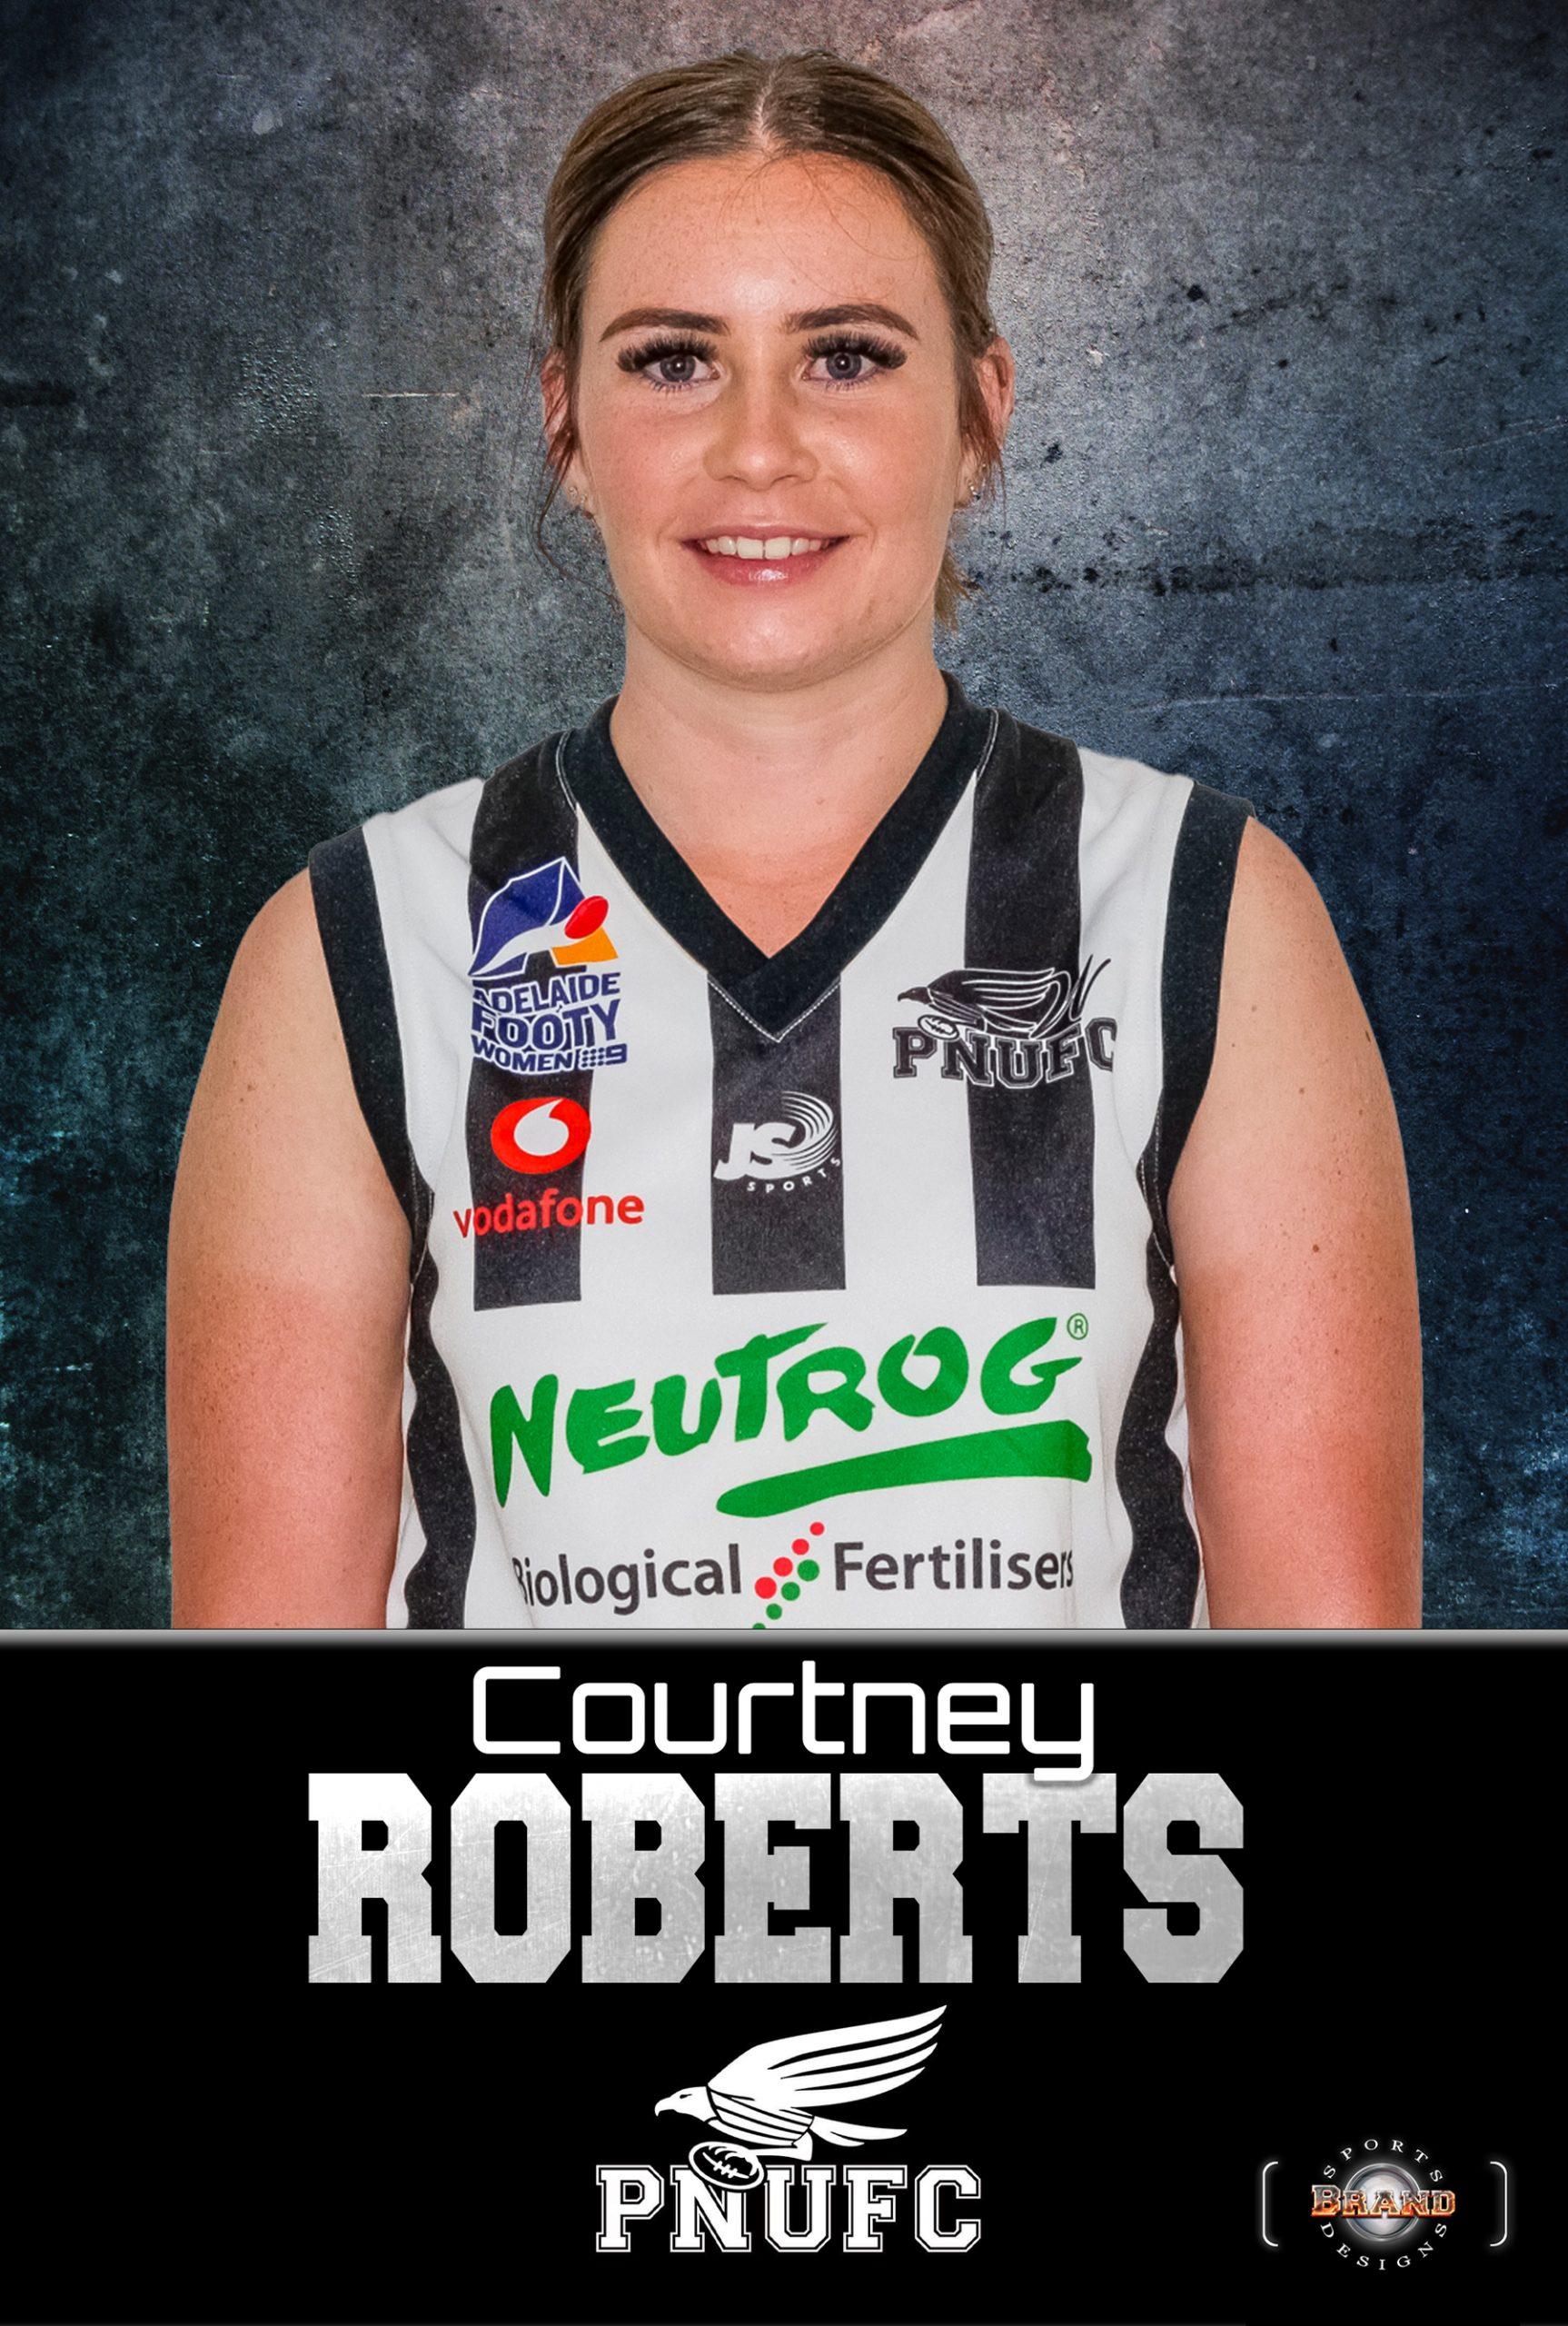 Courtney Roberts